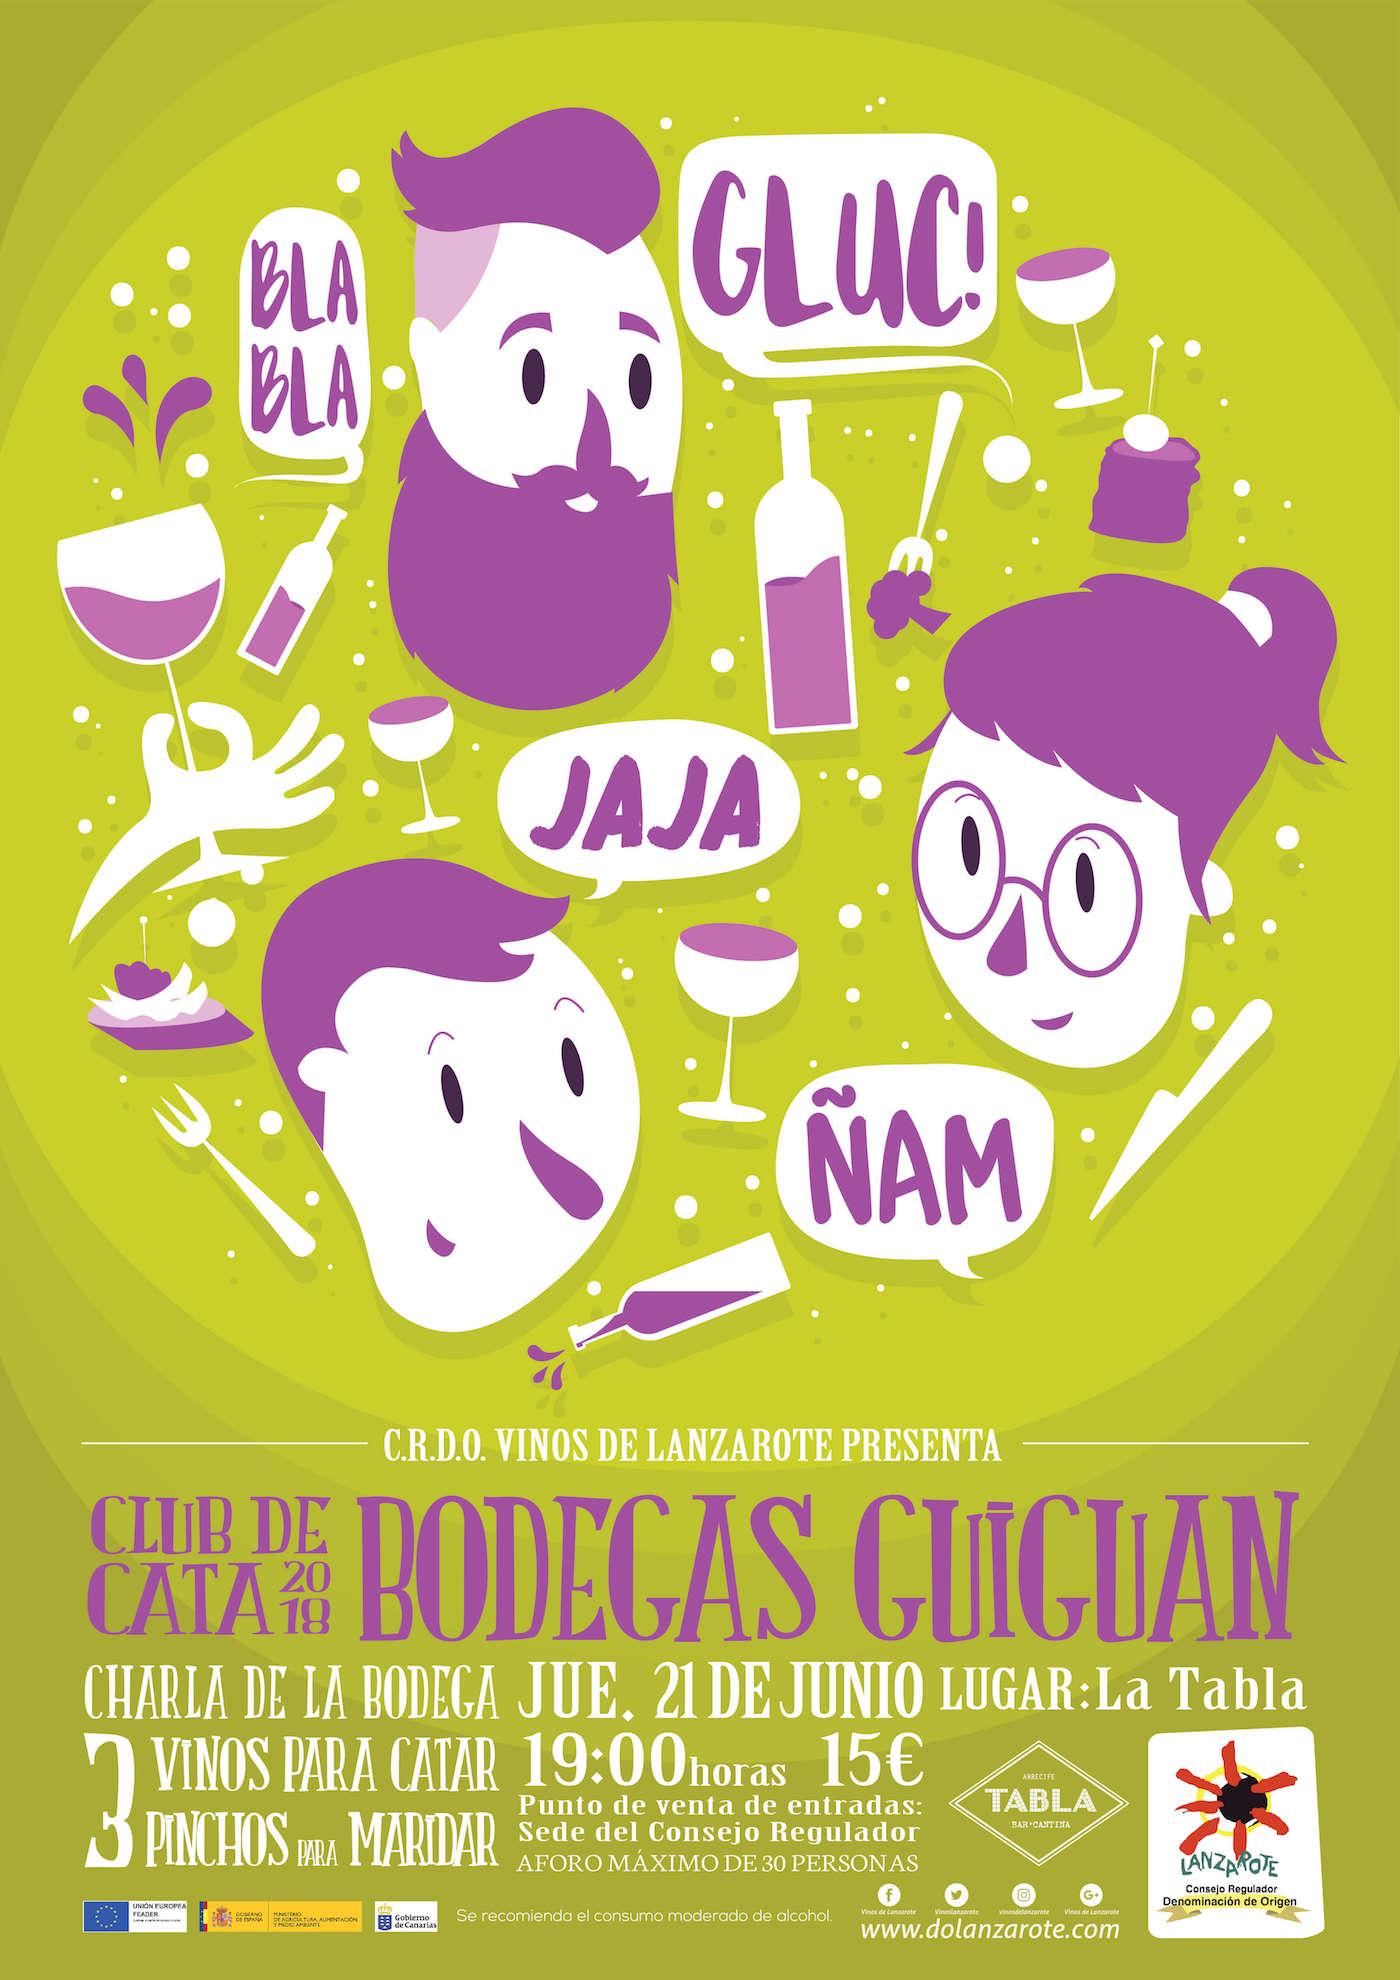 Club-de-Cata-de-vinos-de-Bodegas-Guiguan-de-Lanzarote